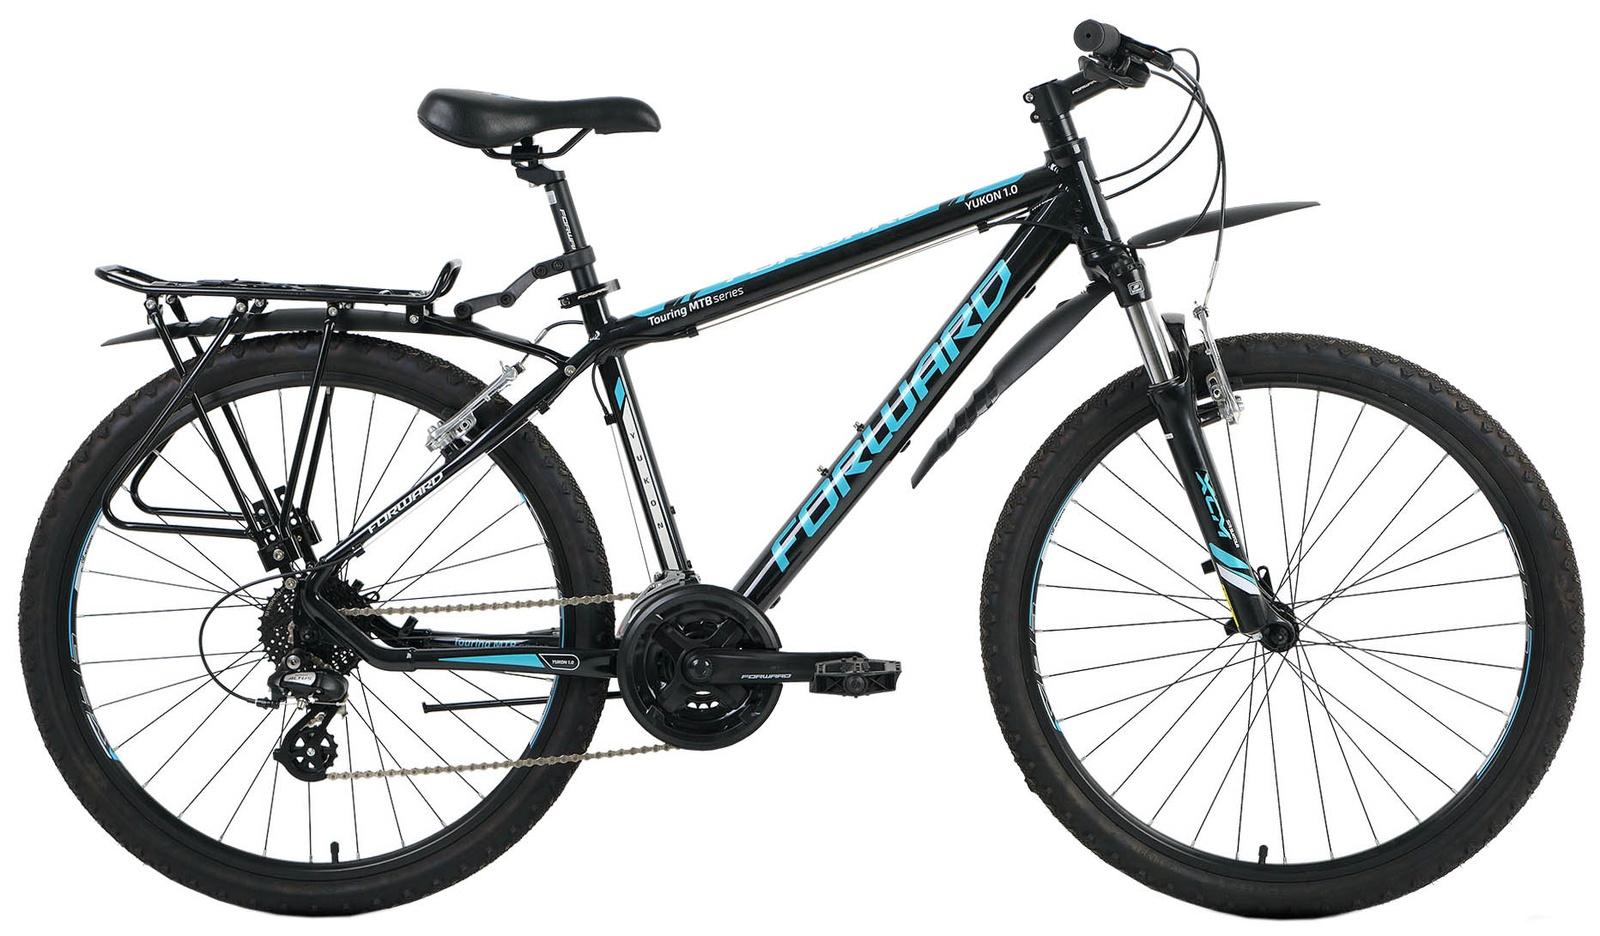 все цены на Велосипед Forward YUKON 1.0, RBKW6M66R017, черный онлайн